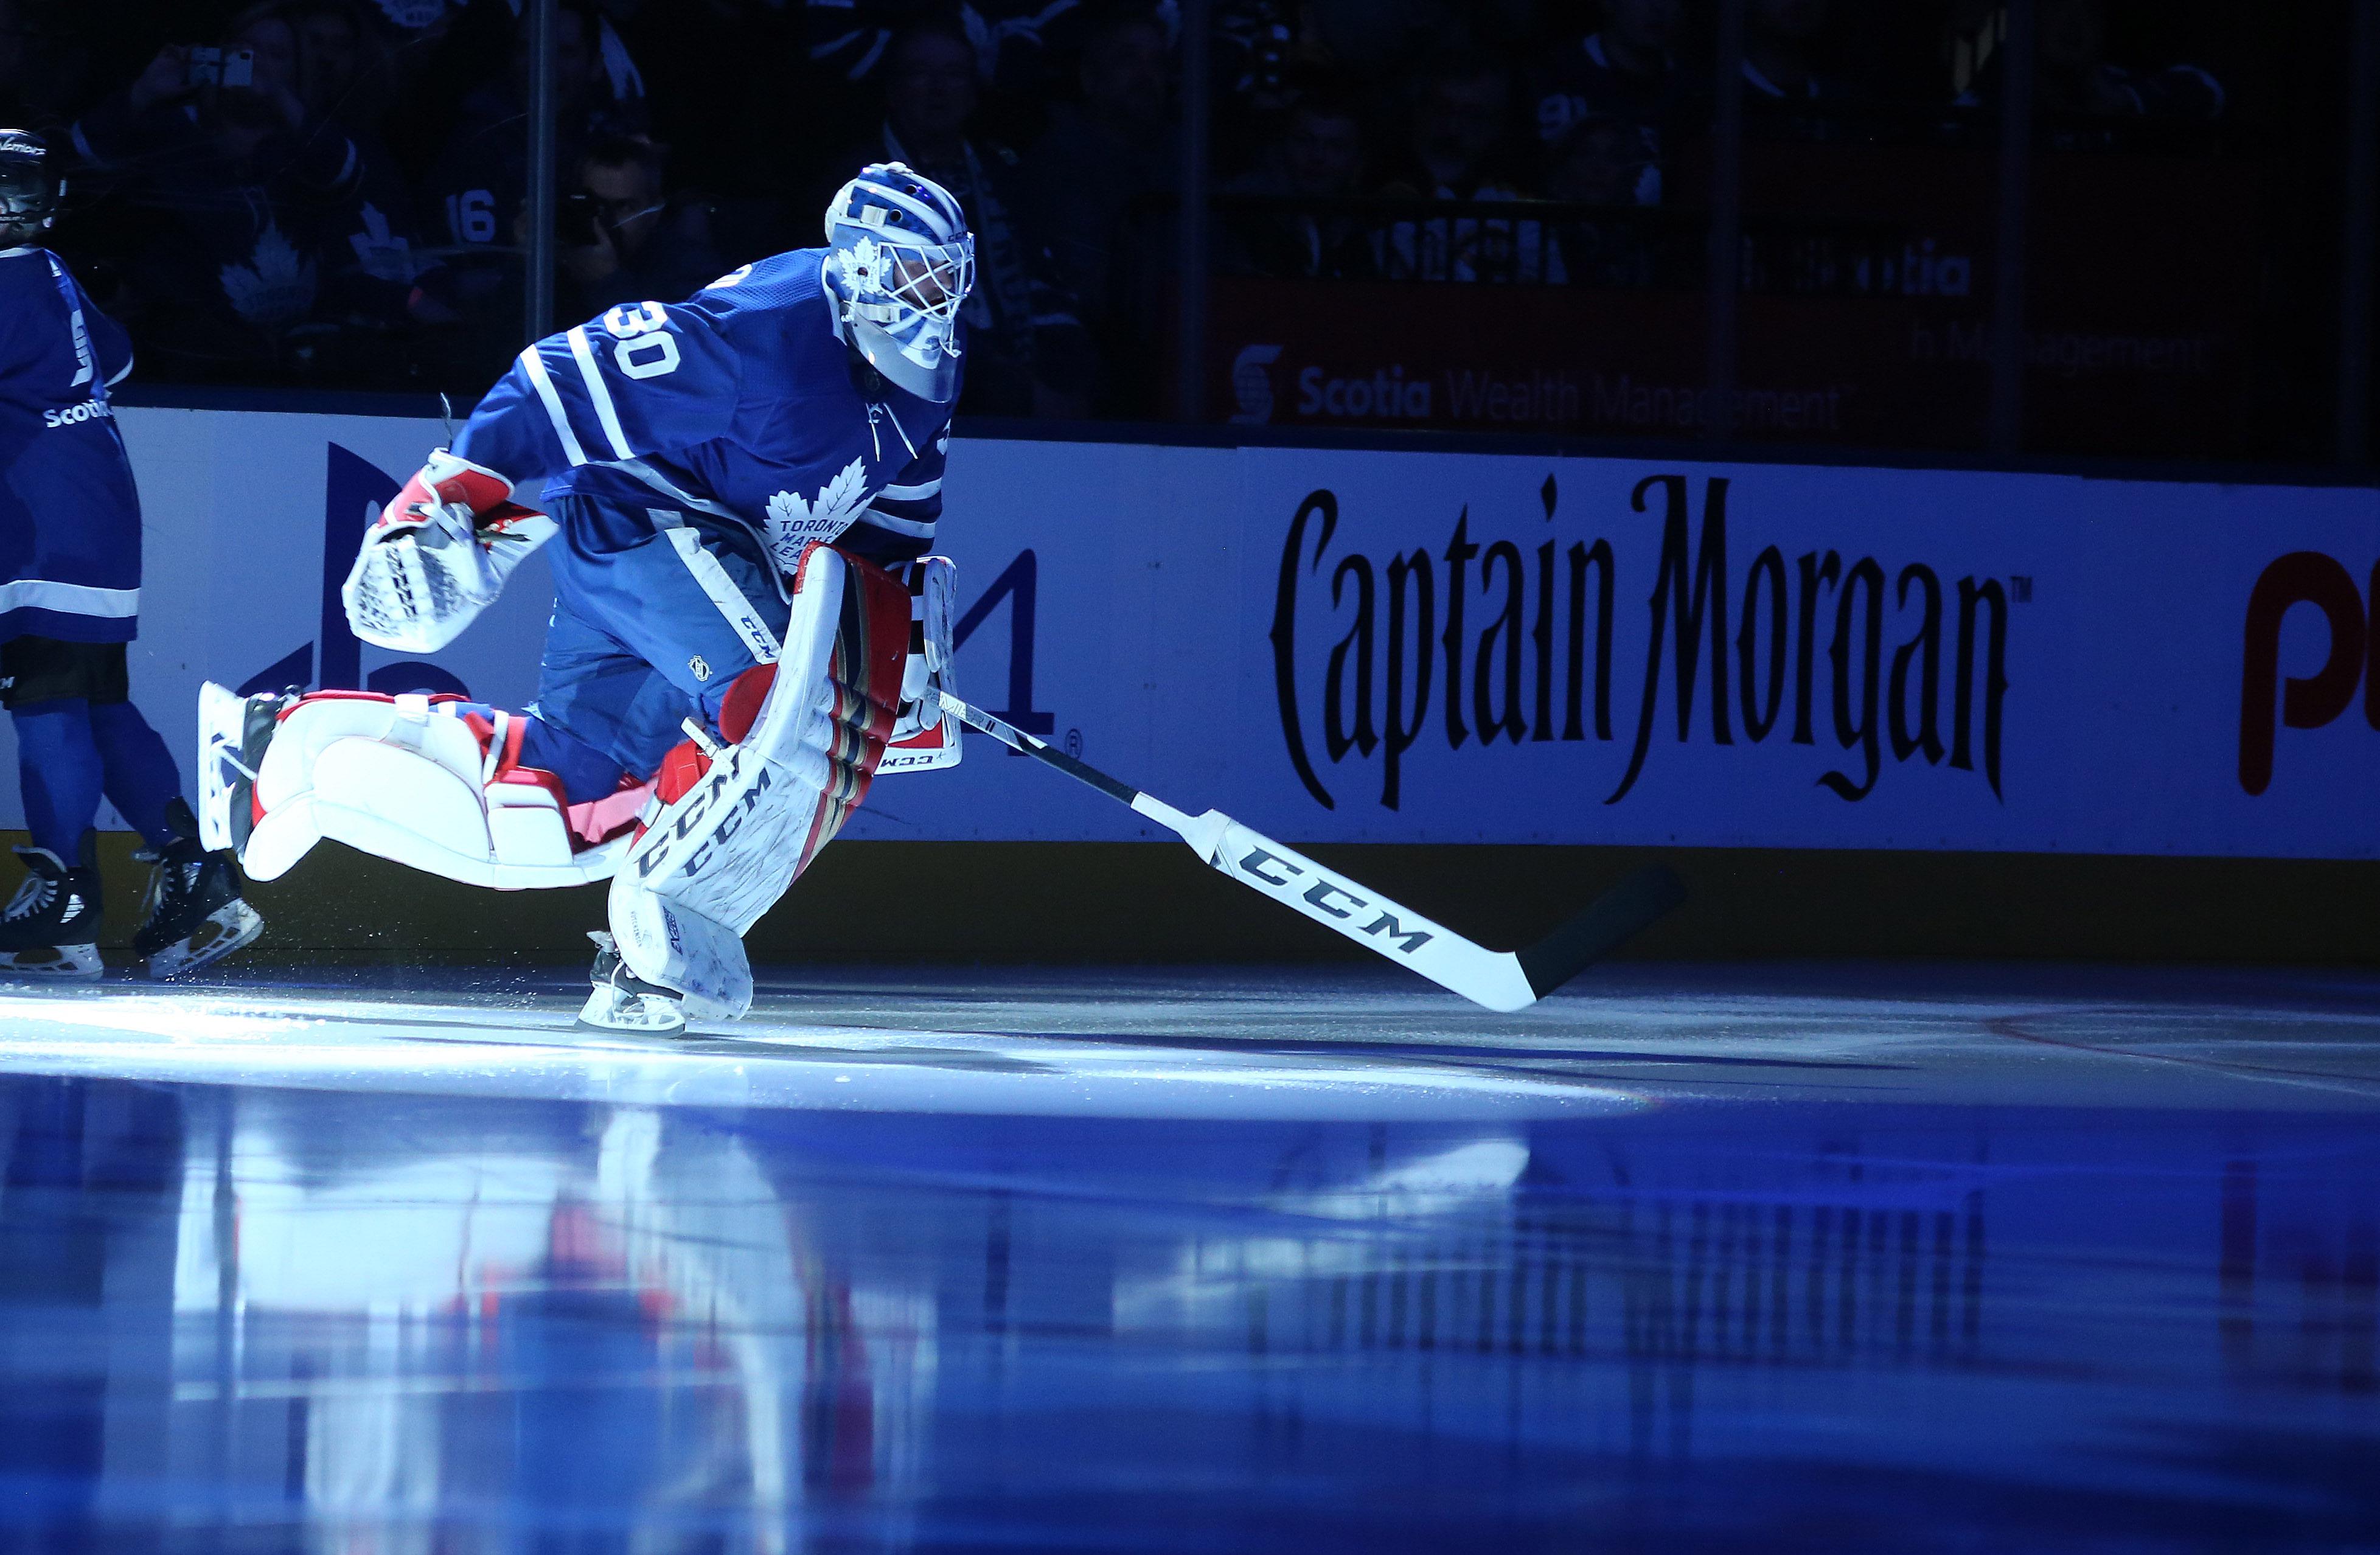 Toronto Maple Leafs fall to the Boston Bruins 3-2